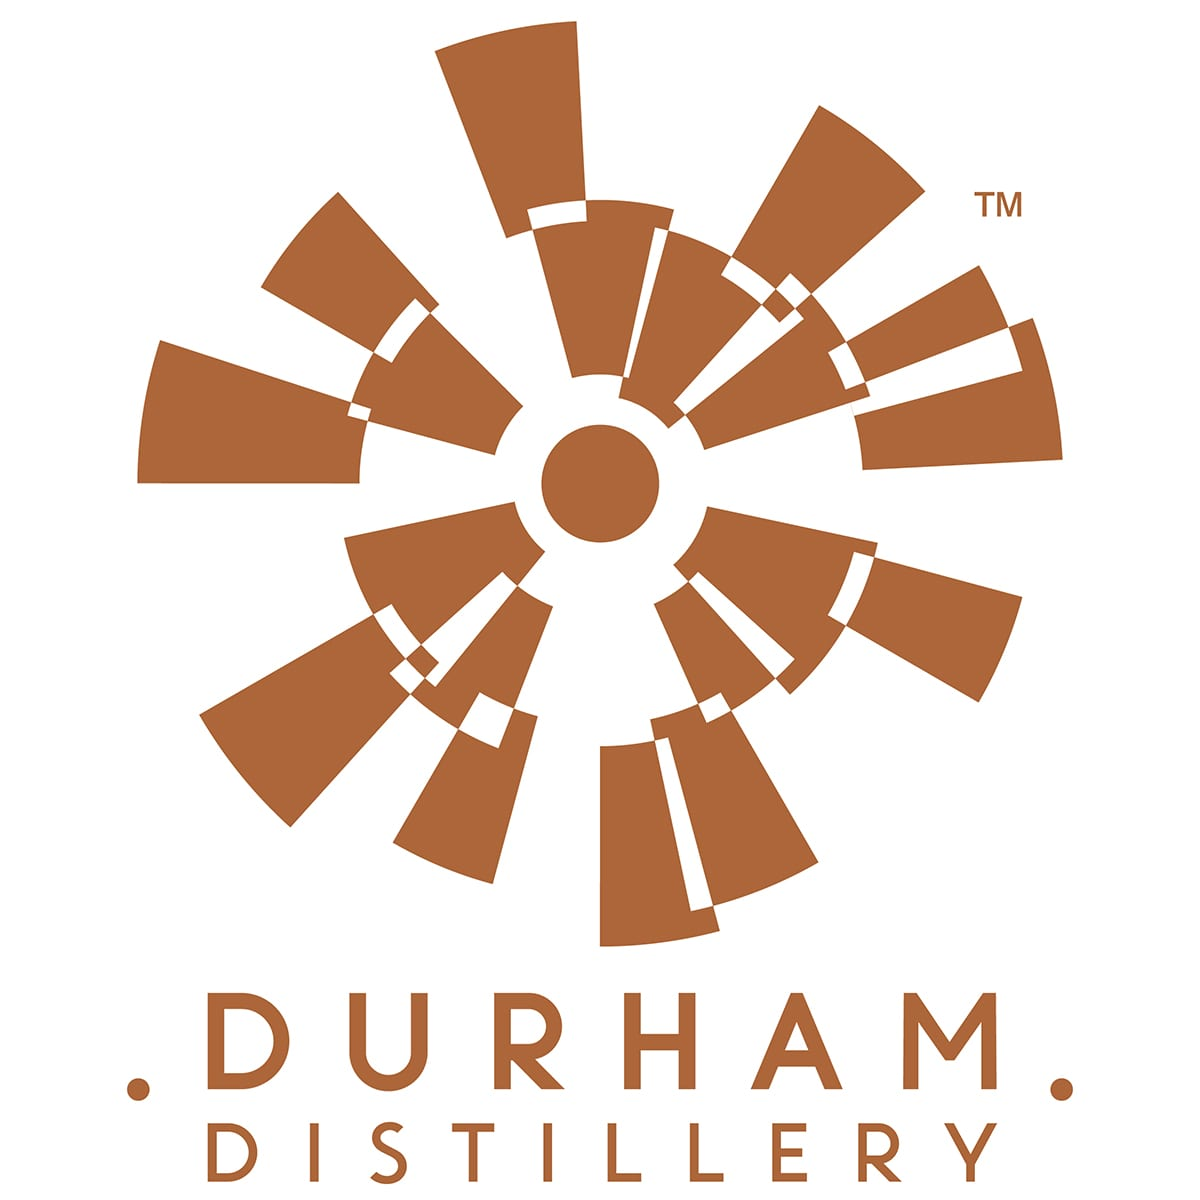 Jon Chadwick, Durham Distillery